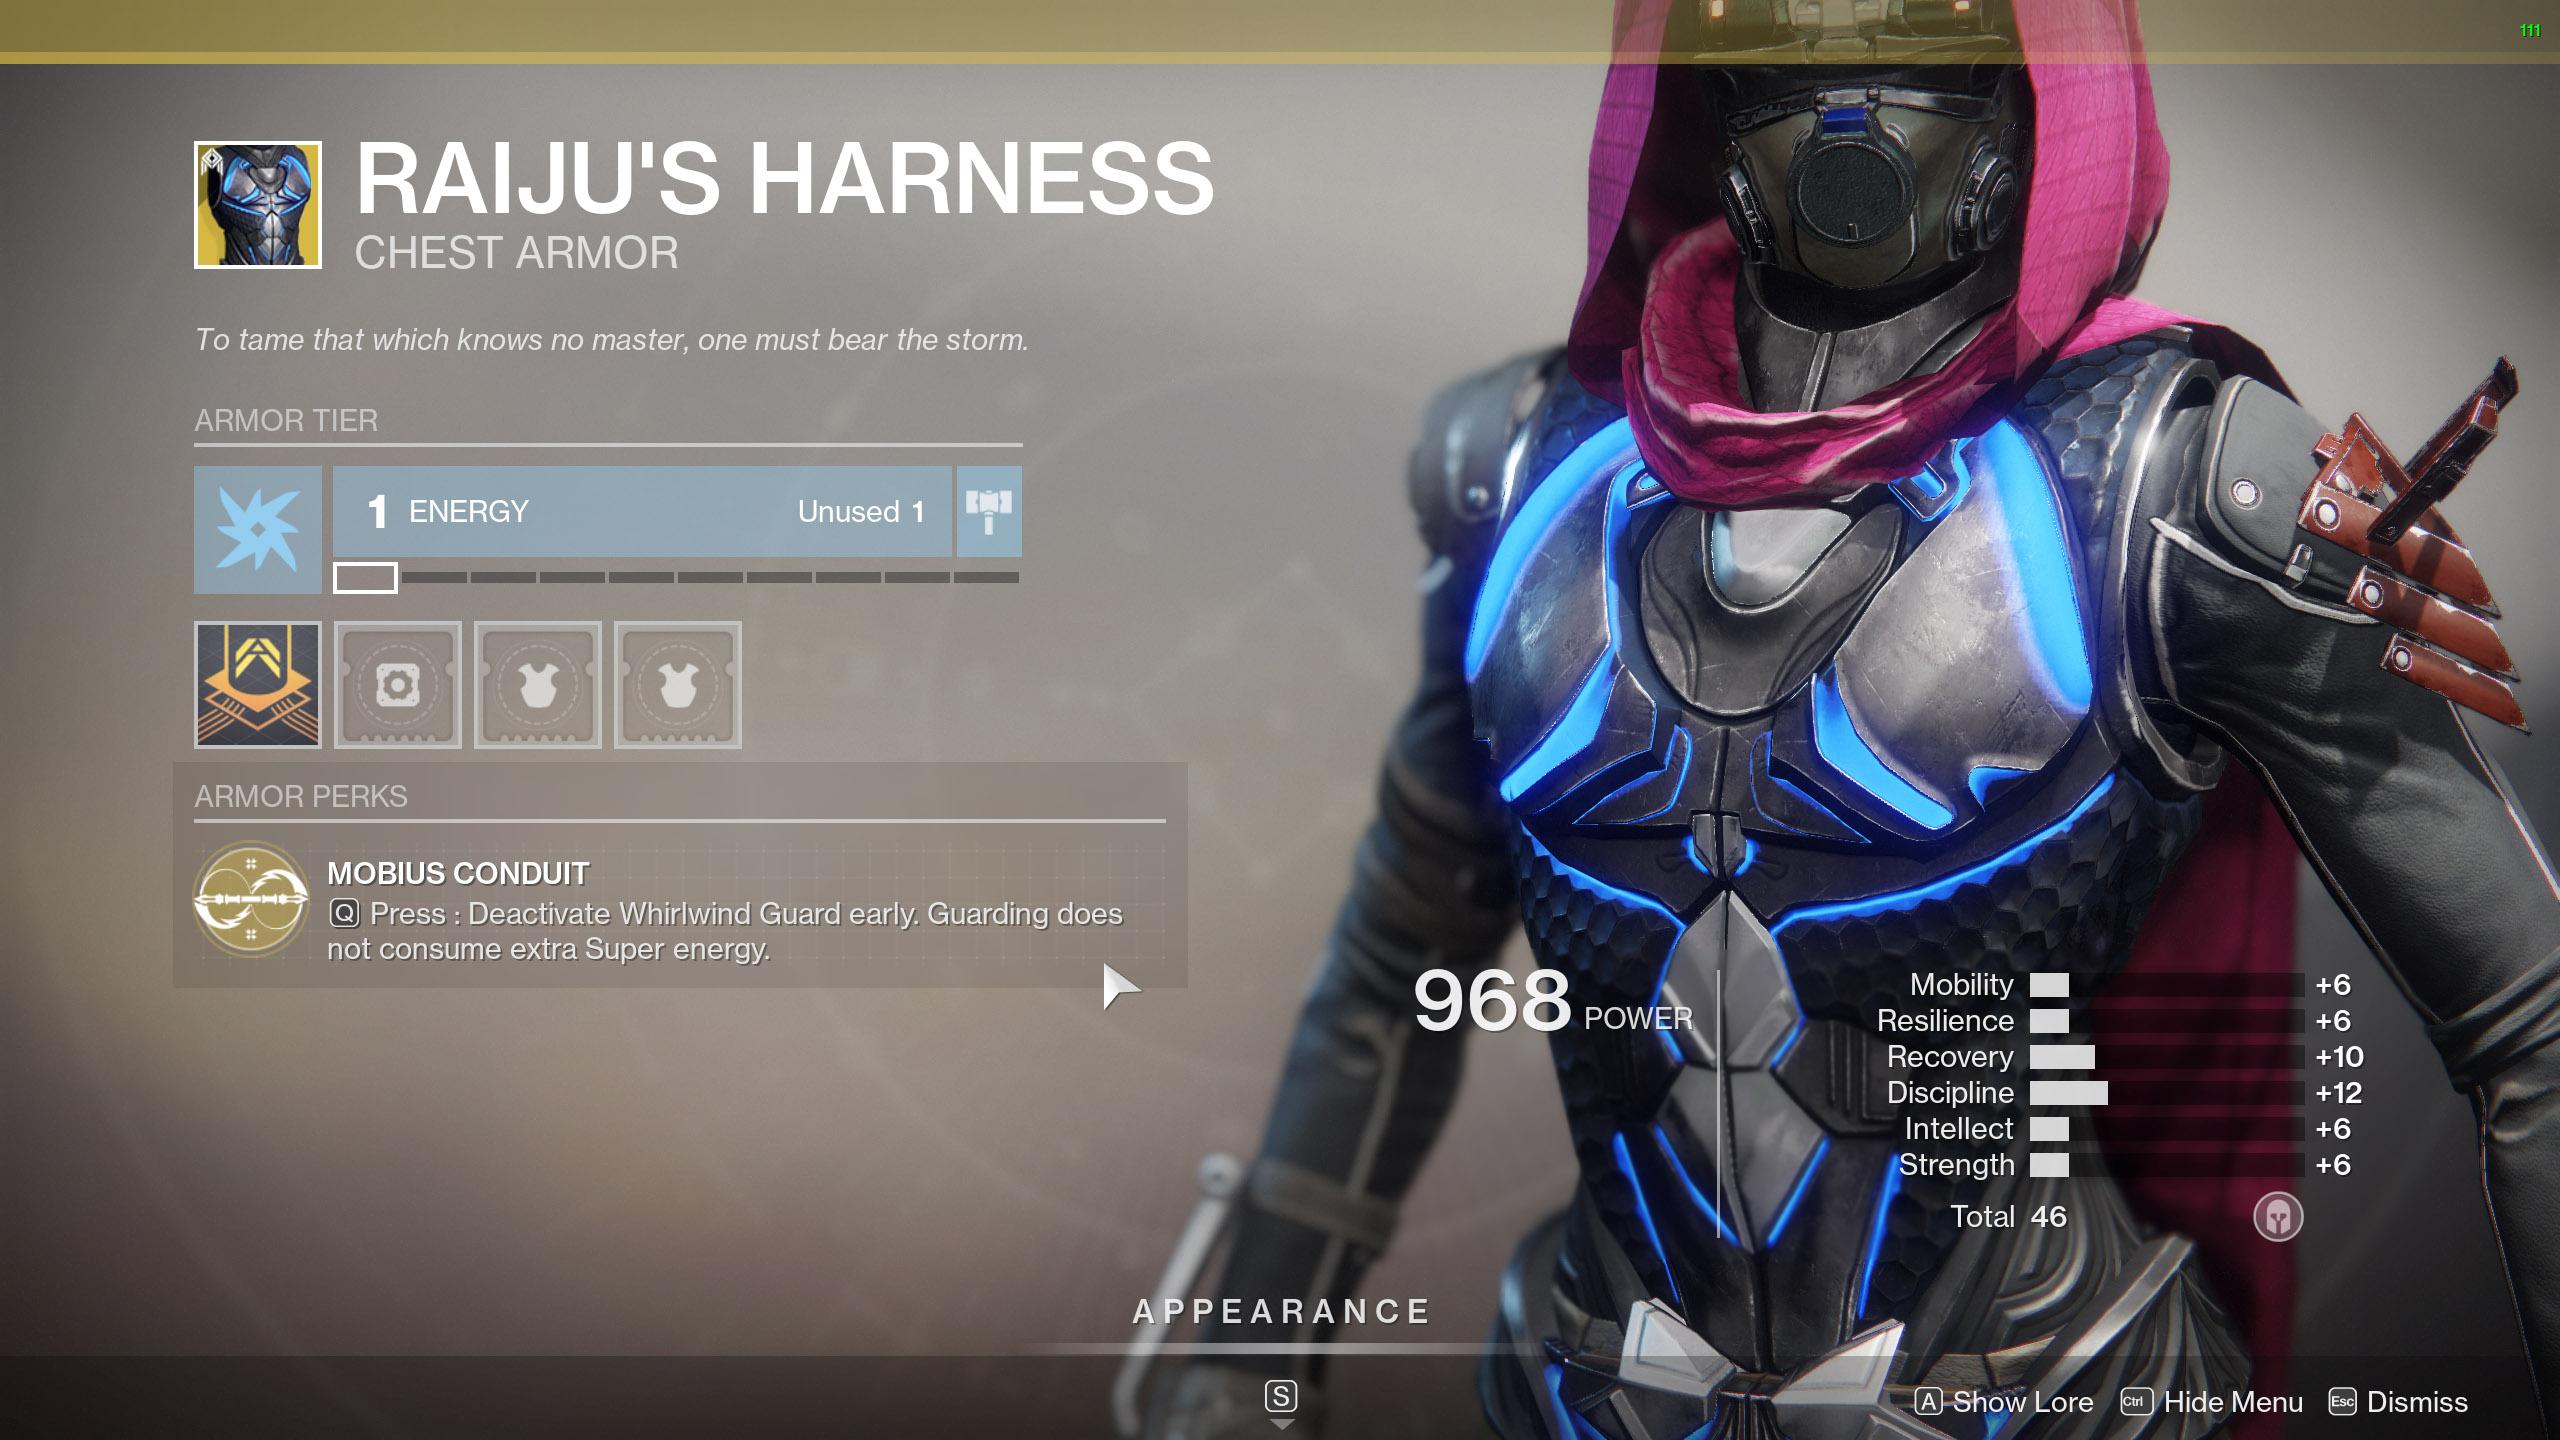 Destiny 2 Exotic Hunter armor Raiju's Harness